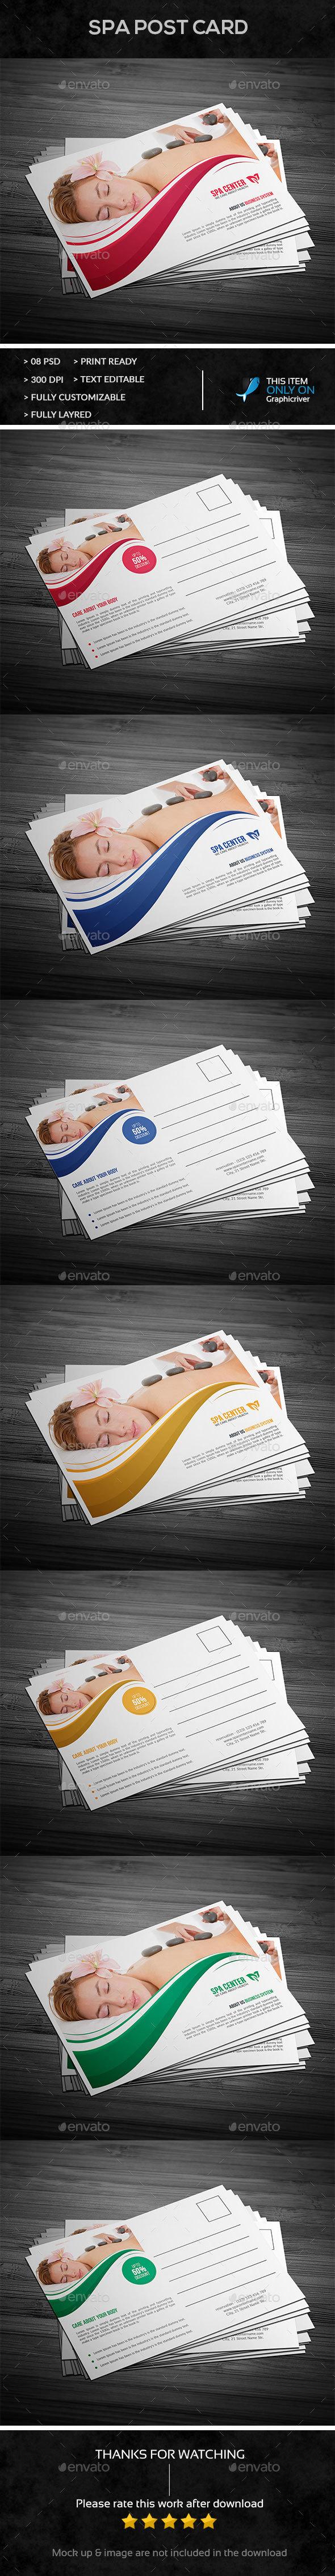 Spa Post Card Design  - Cards & Invites Print Templates